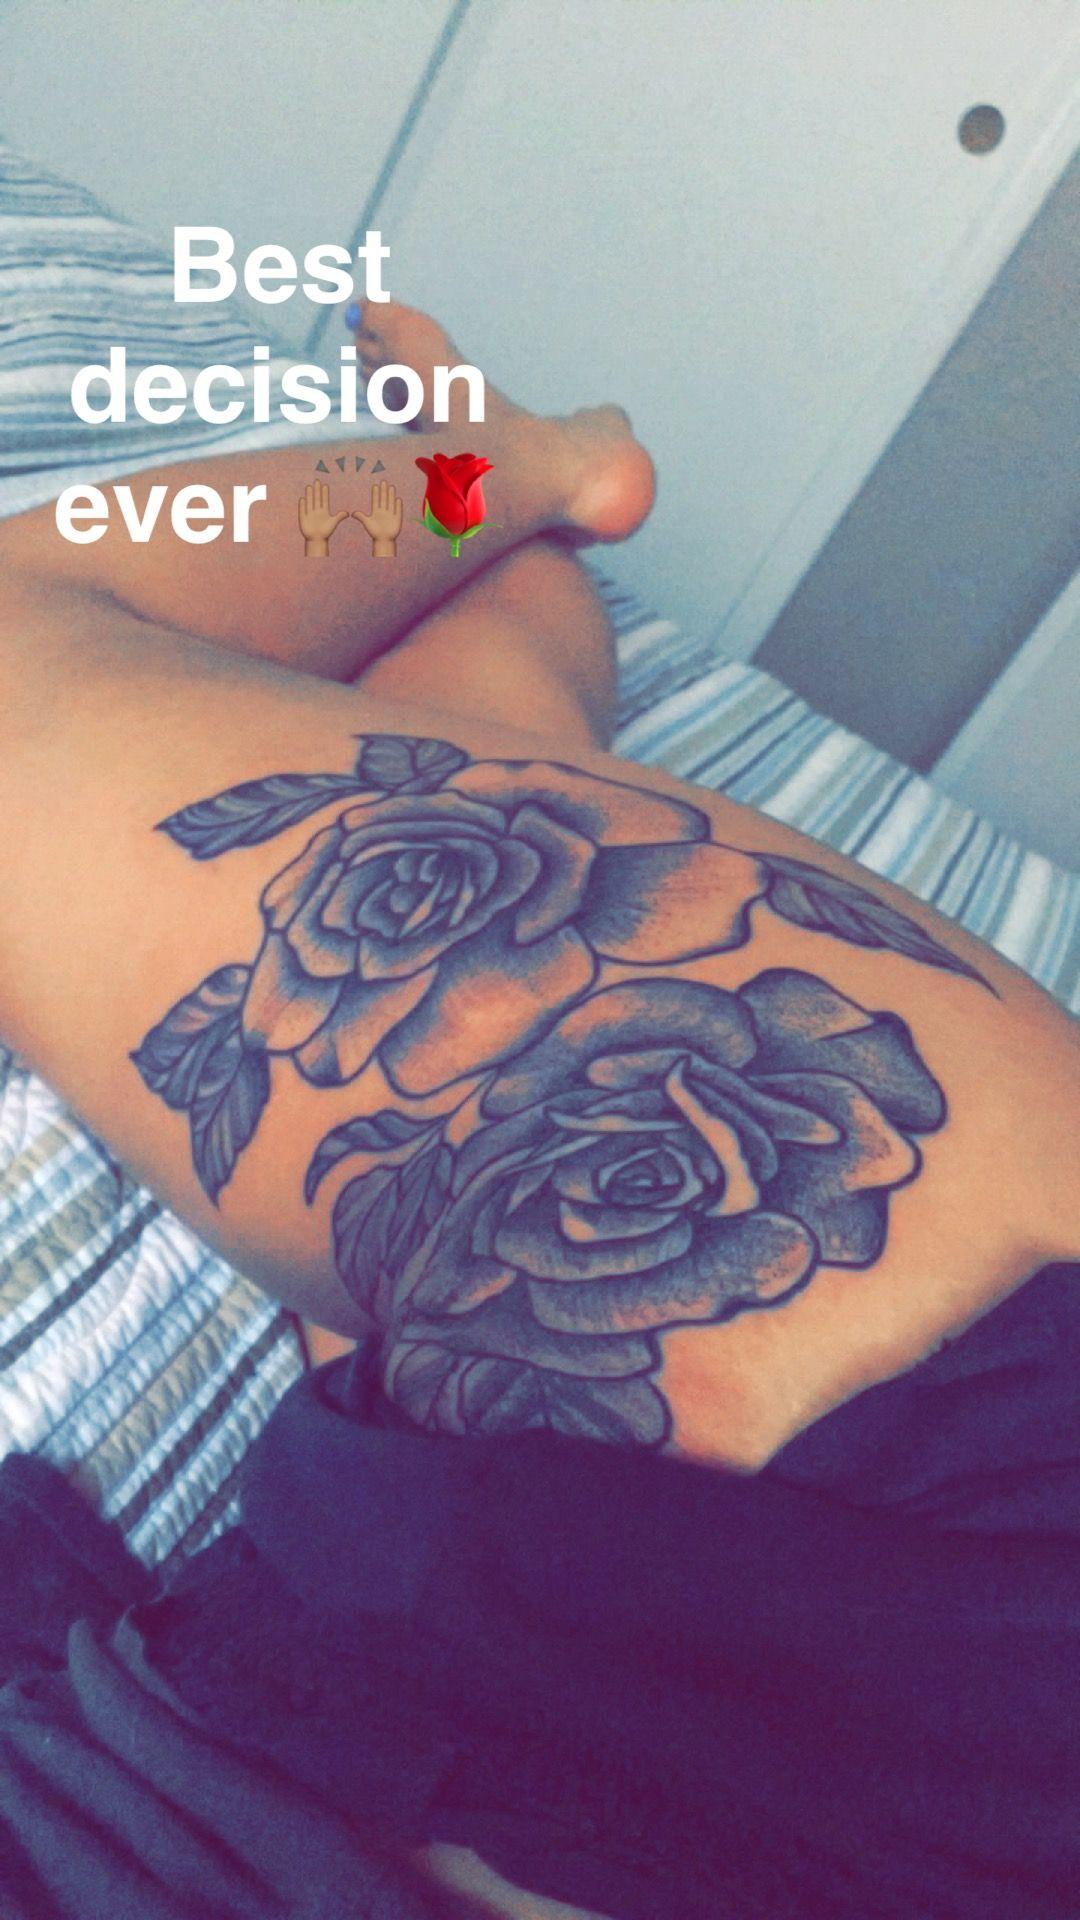 rose thigh tattoo tattoos i need pinterest rose thigh tattoos thighs and tattoo. Black Bedroom Furniture Sets. Home Design Ideas